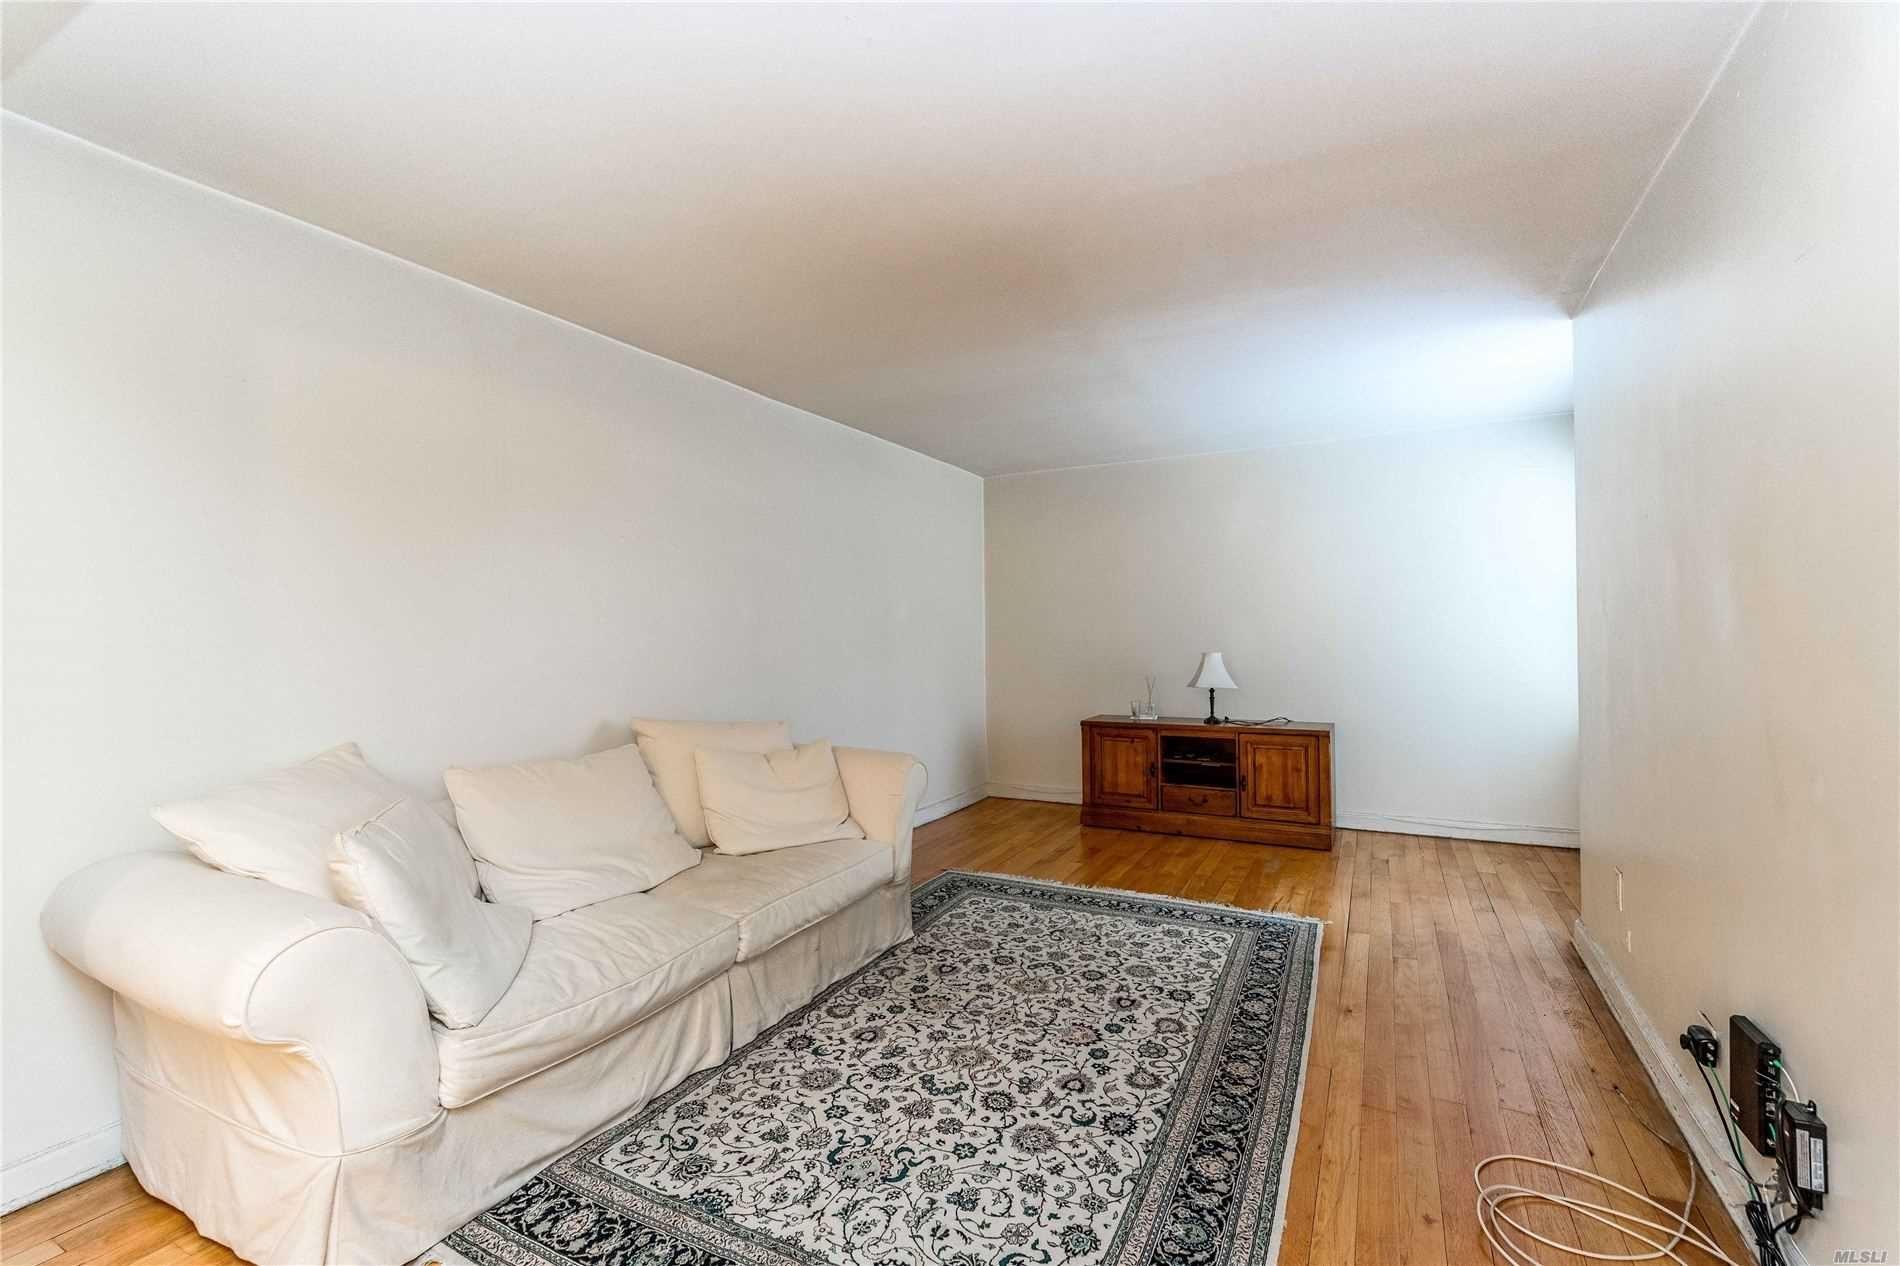 39-55 51 Street #2D, Woodside, NY 11377 - MLS#: 3232918